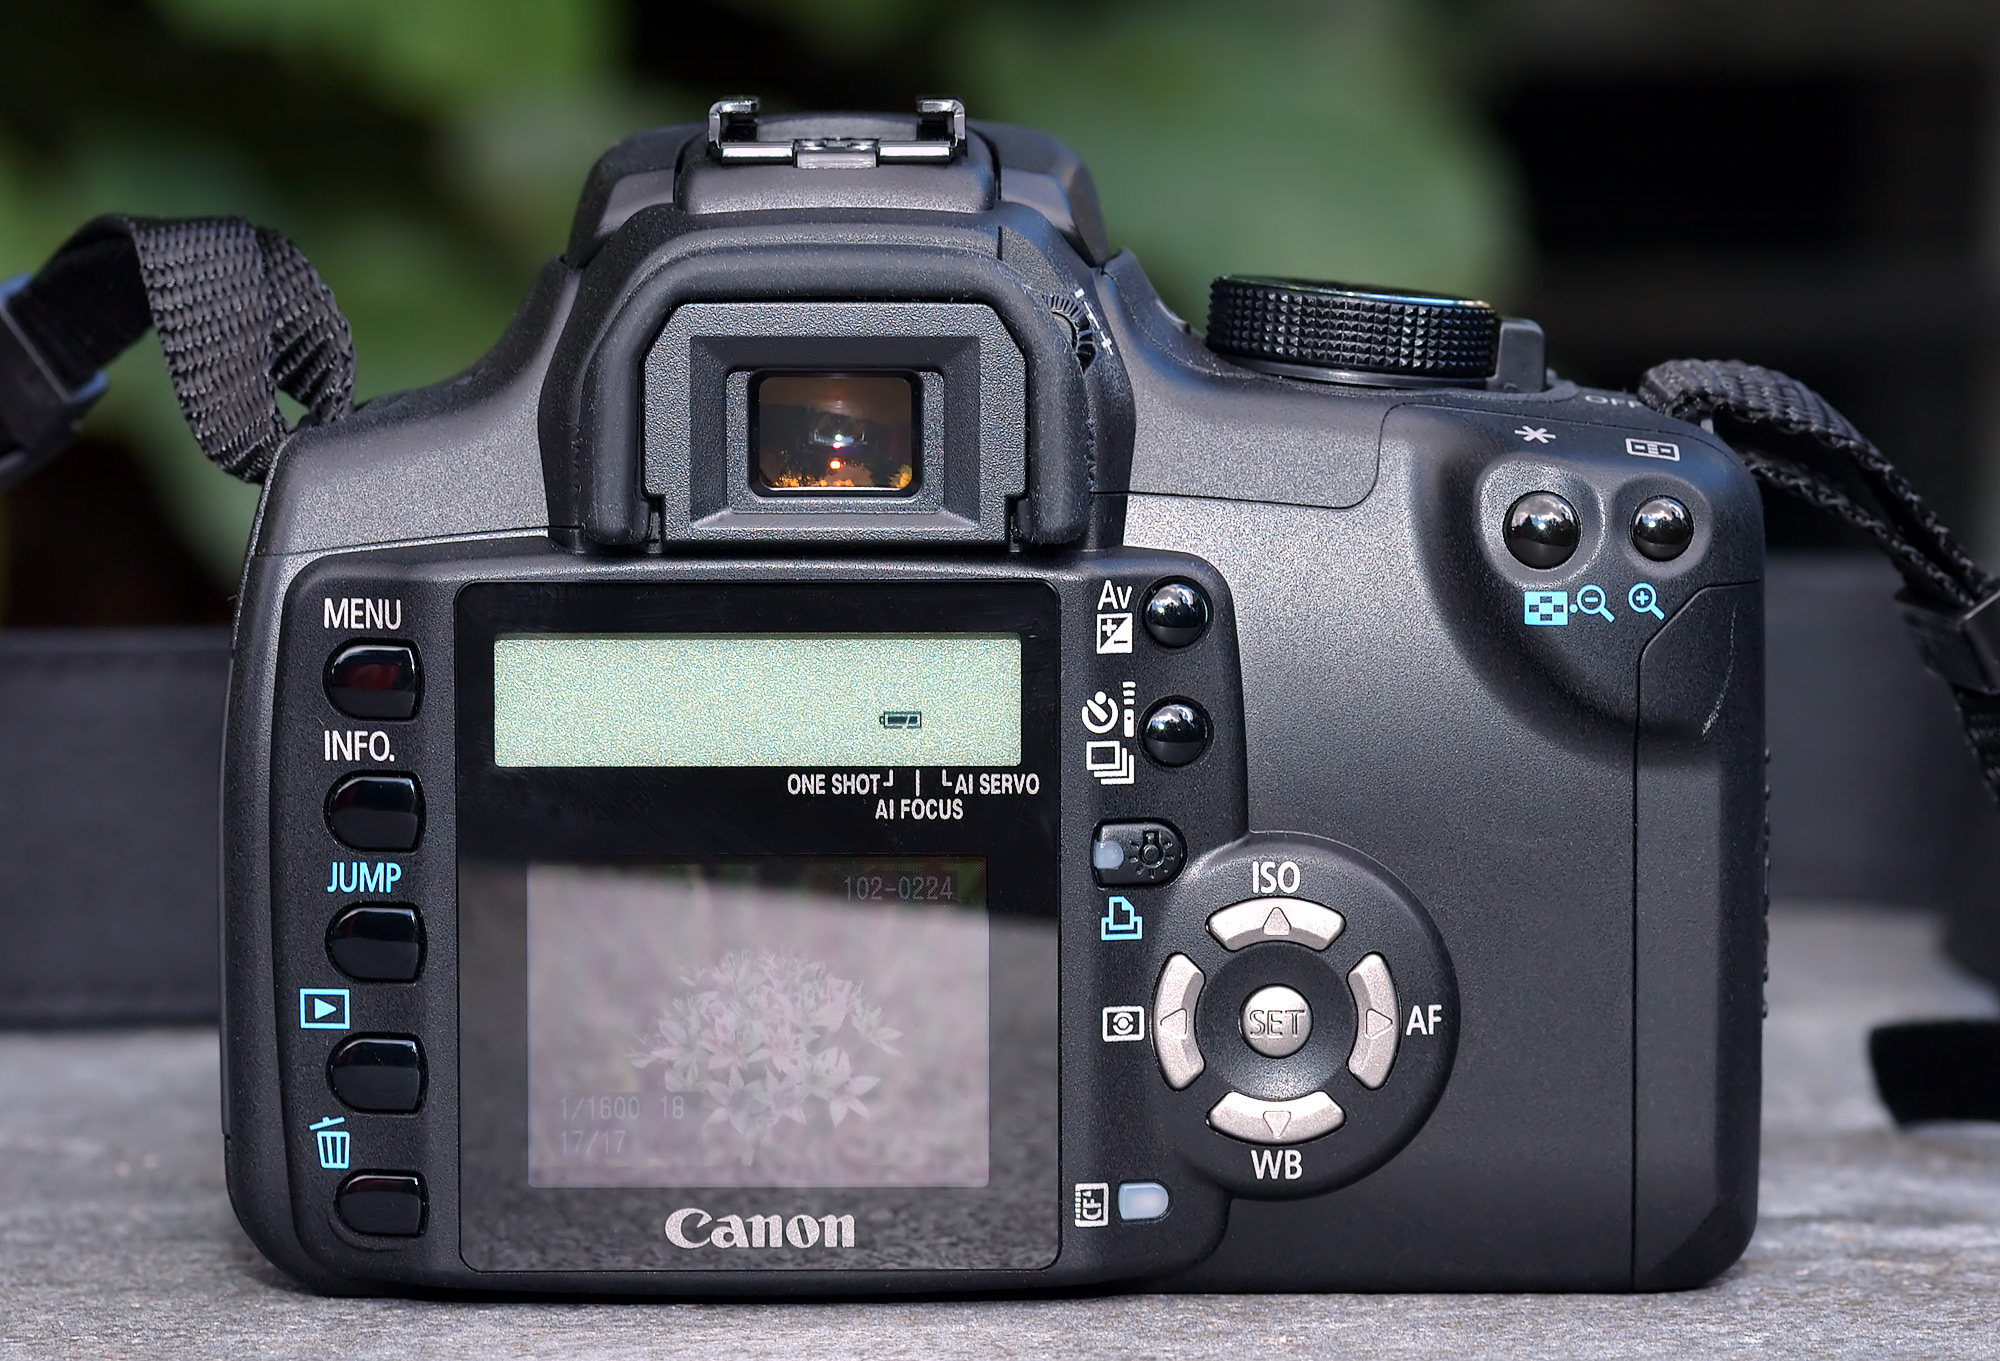 canon eos 350d bilder